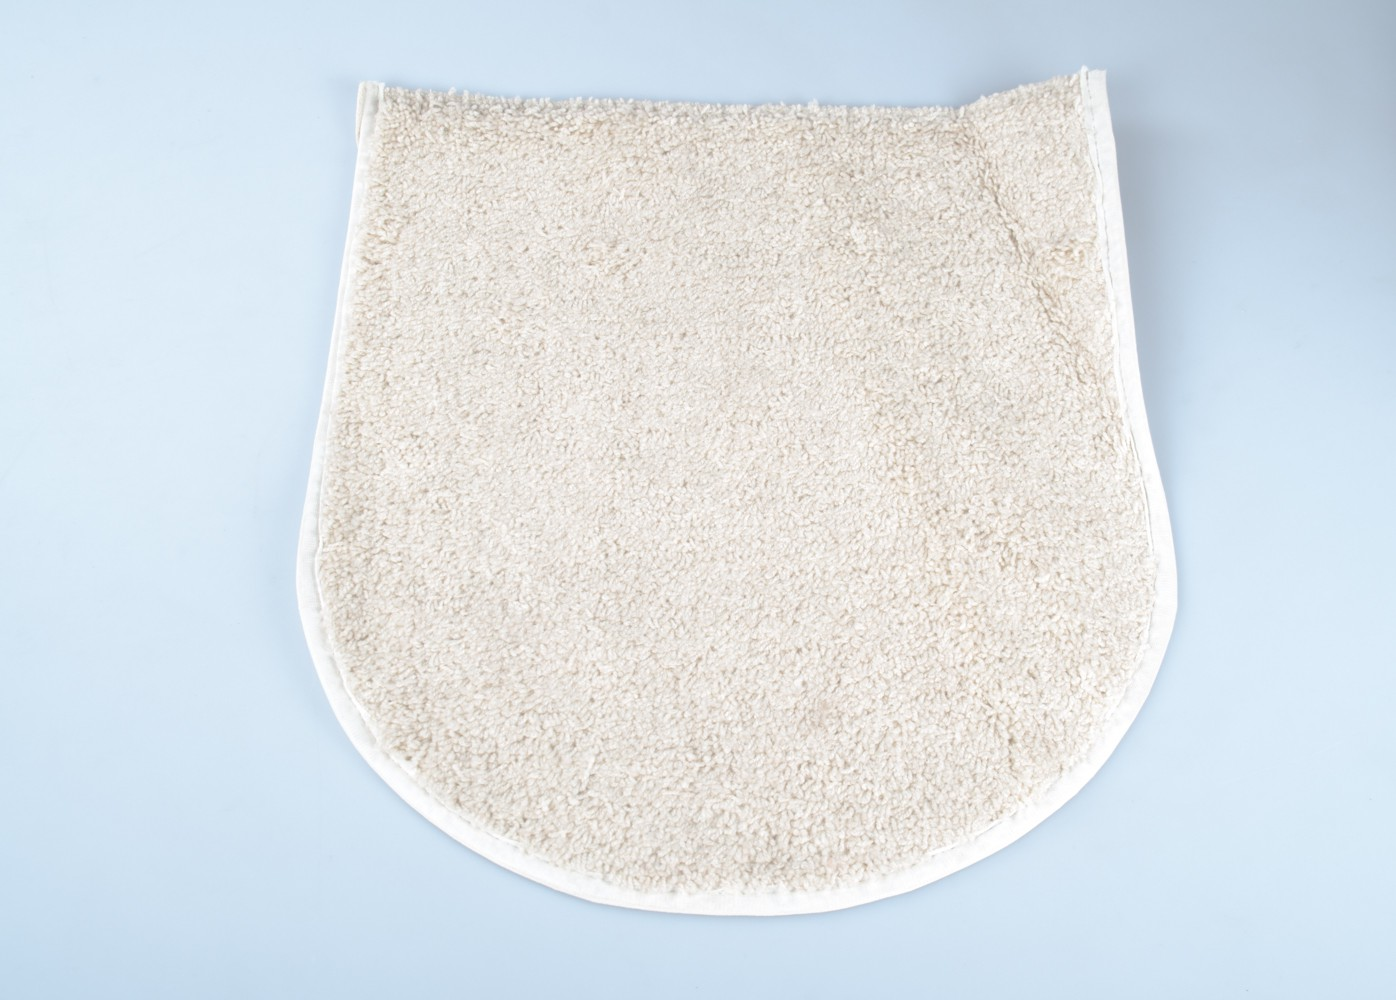 2x klodeckelbezug toilettendeckel toilettendeckelbezug badgarnitur klodeckel ebay. Black Bedroom Furniture Sets. Home Design Ideas